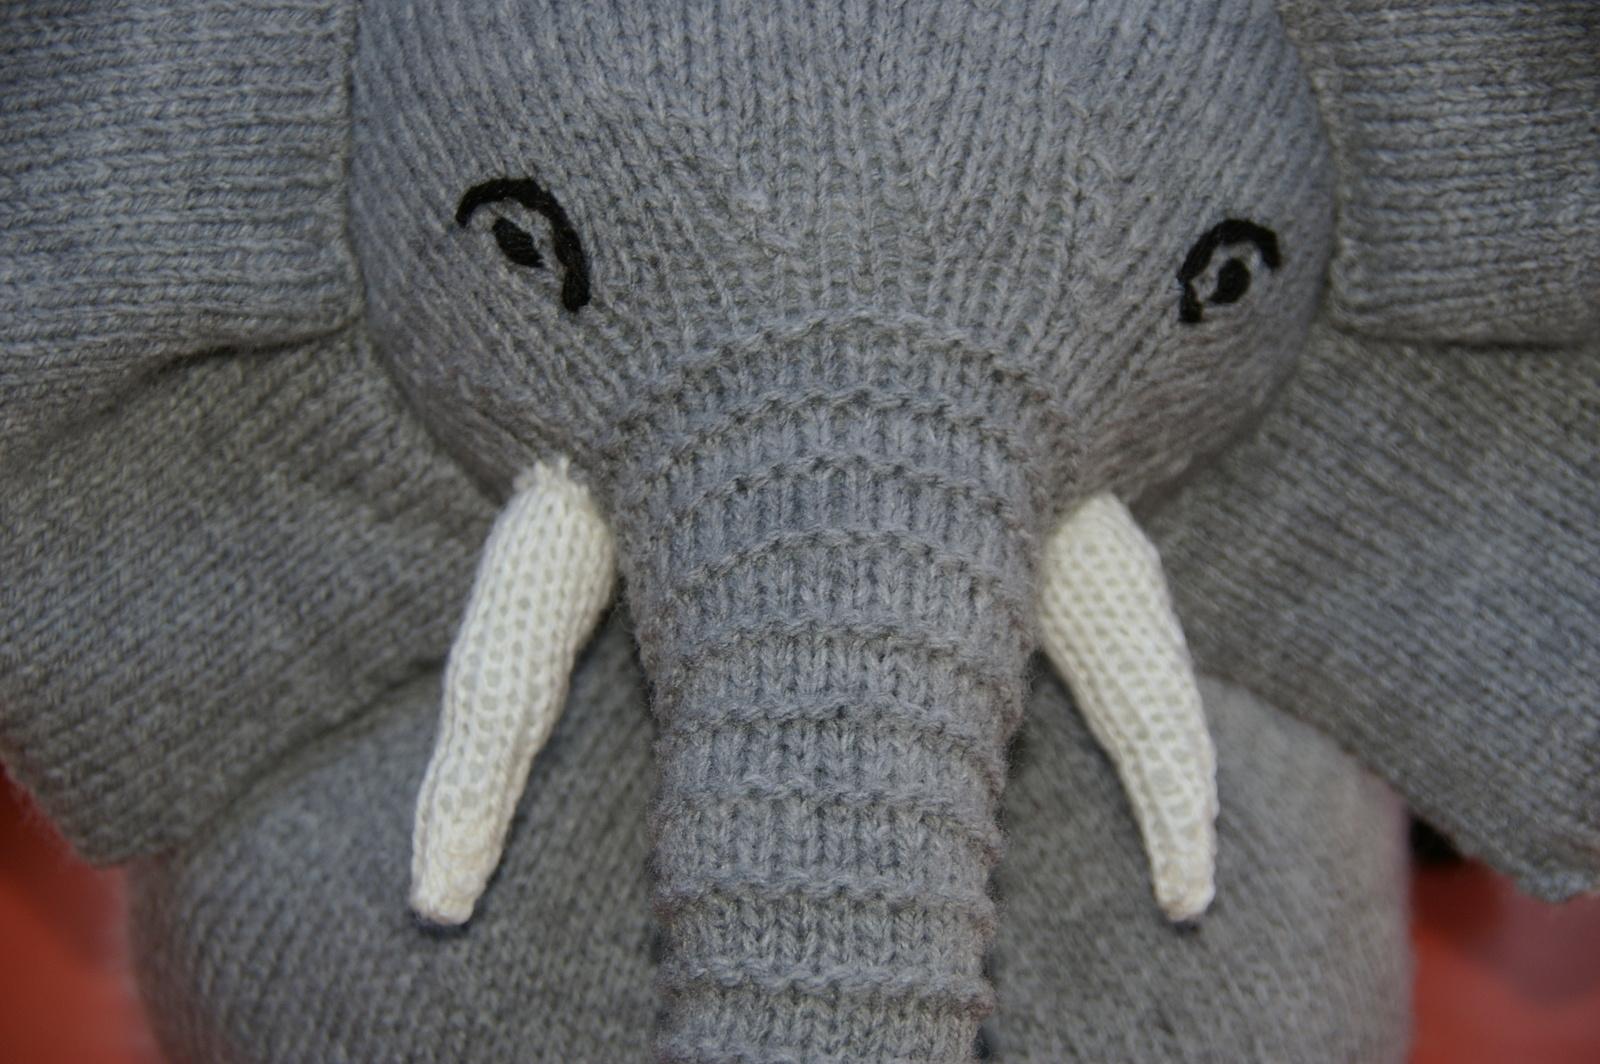 Notre éléphant en gros plan.